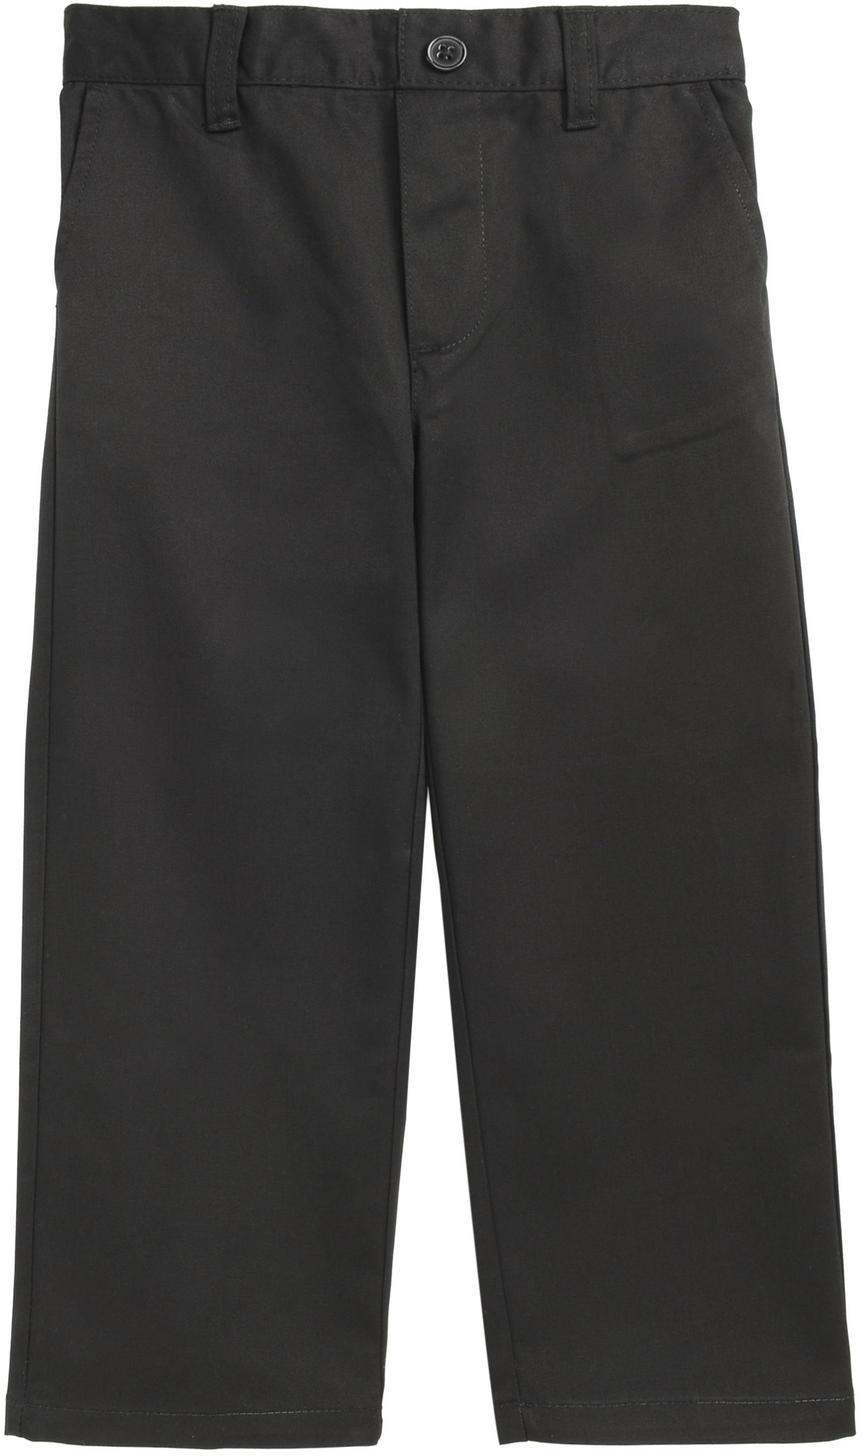 French Toast School Uniform Boys Pull On Pants, Black, 2T